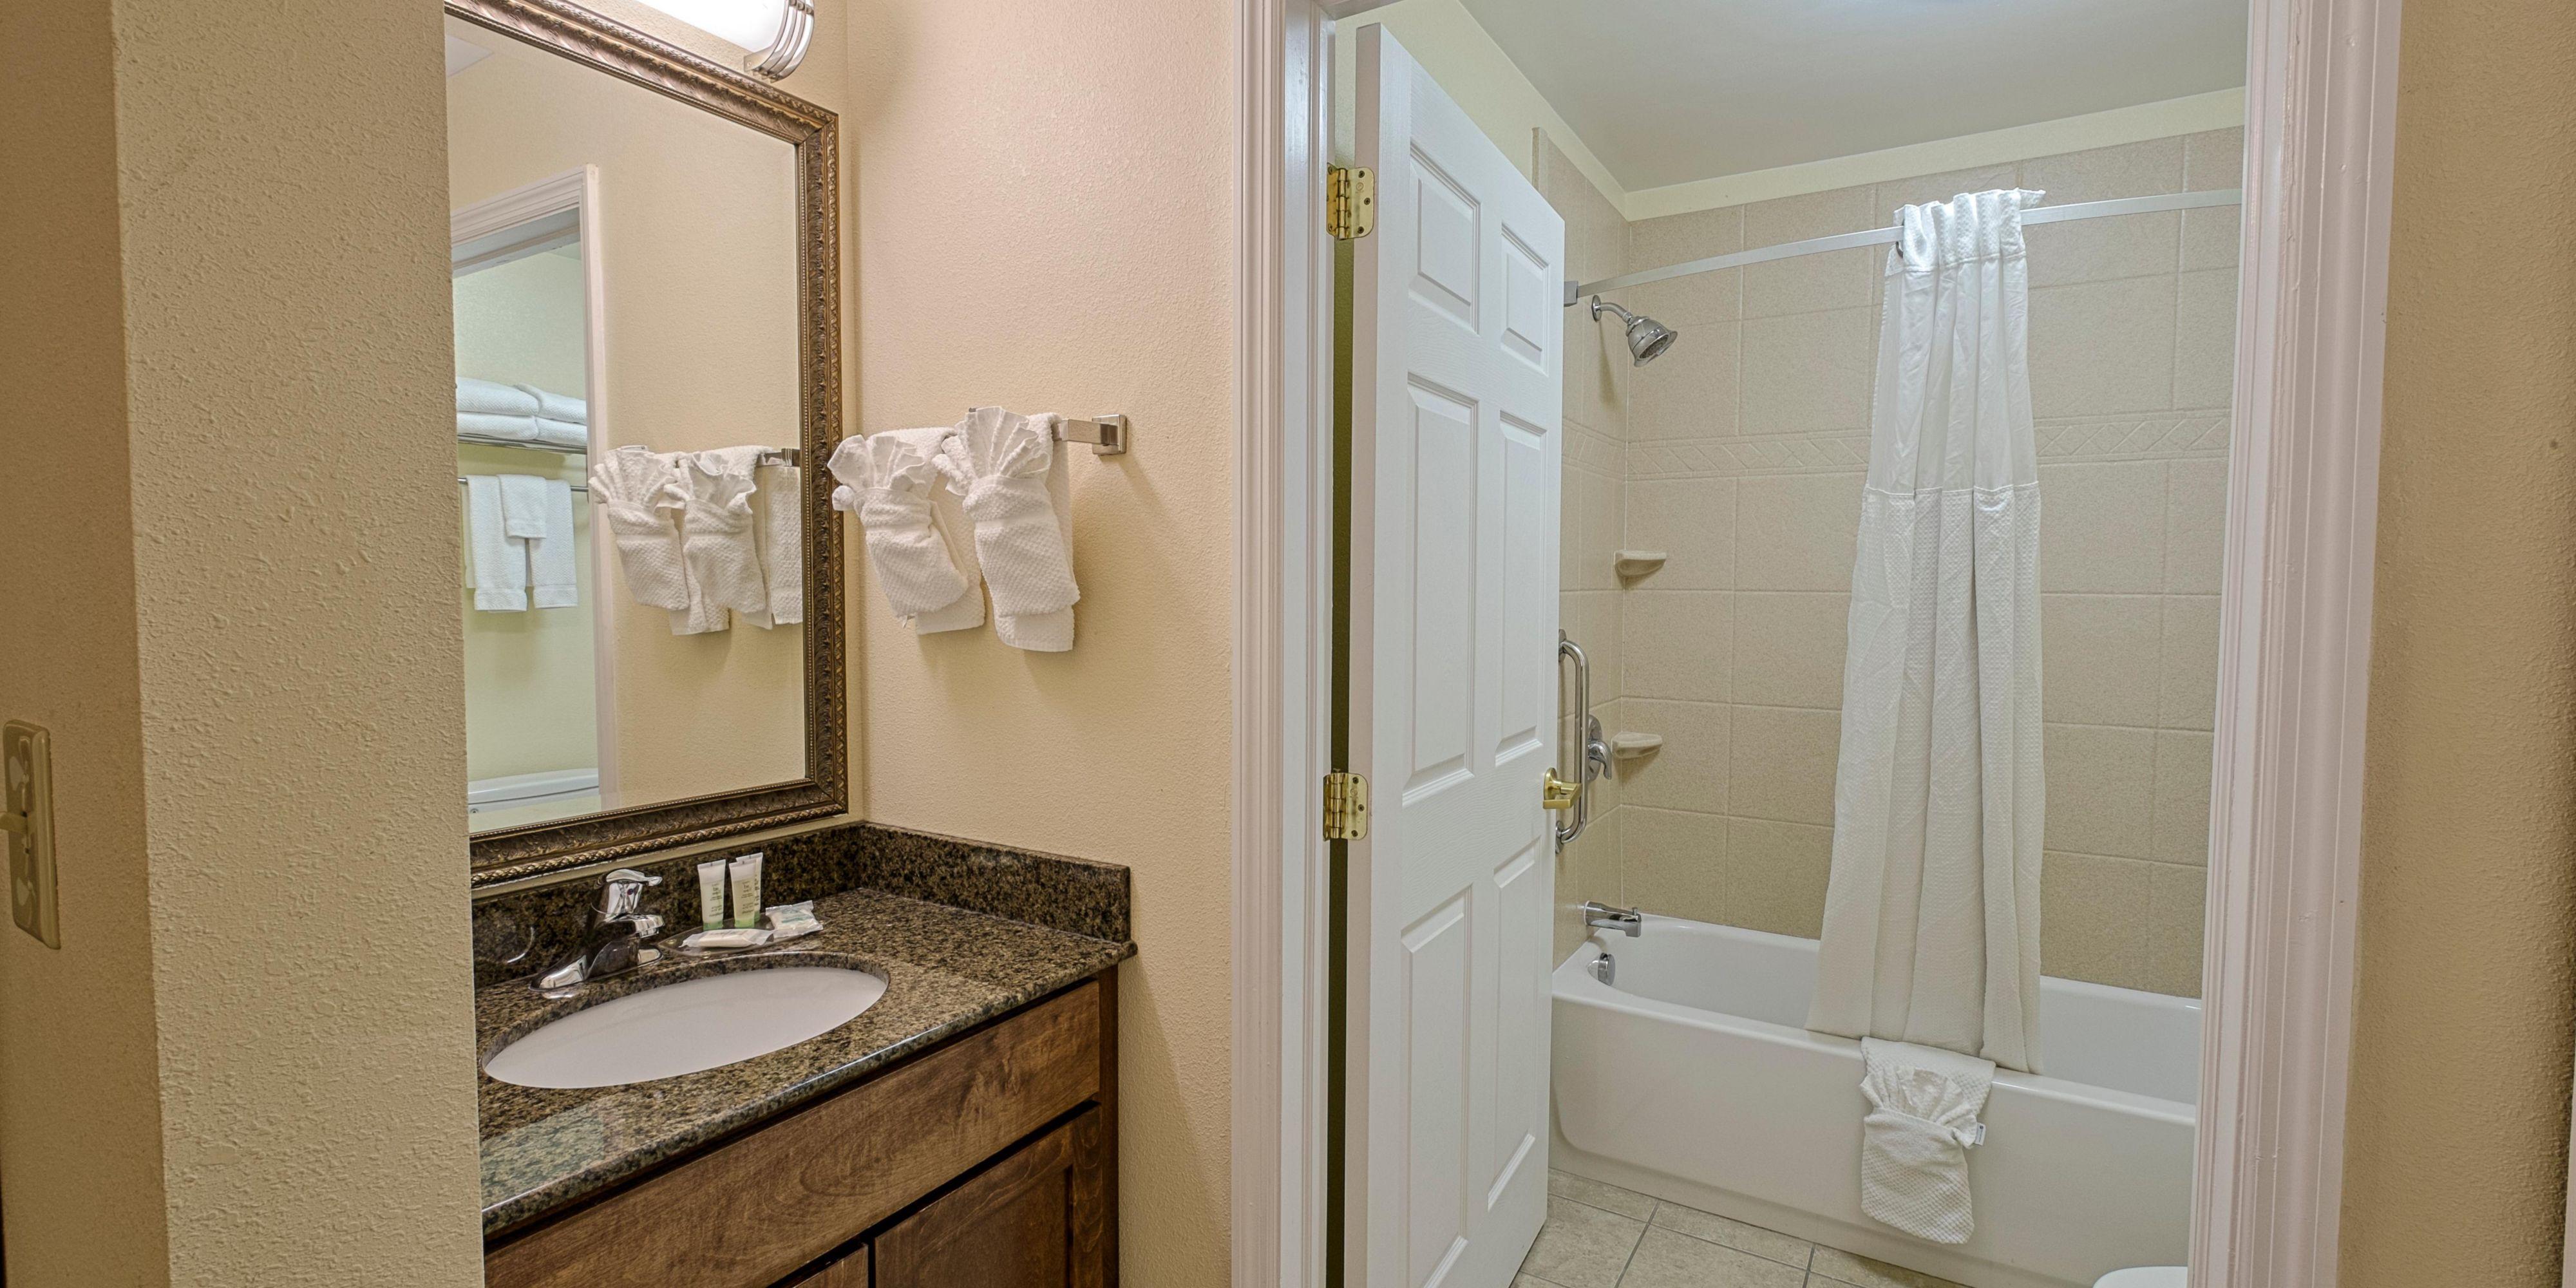 Staybridge Suites Harrisburg Hotels | Harrisburg Hershey | Hotel ...